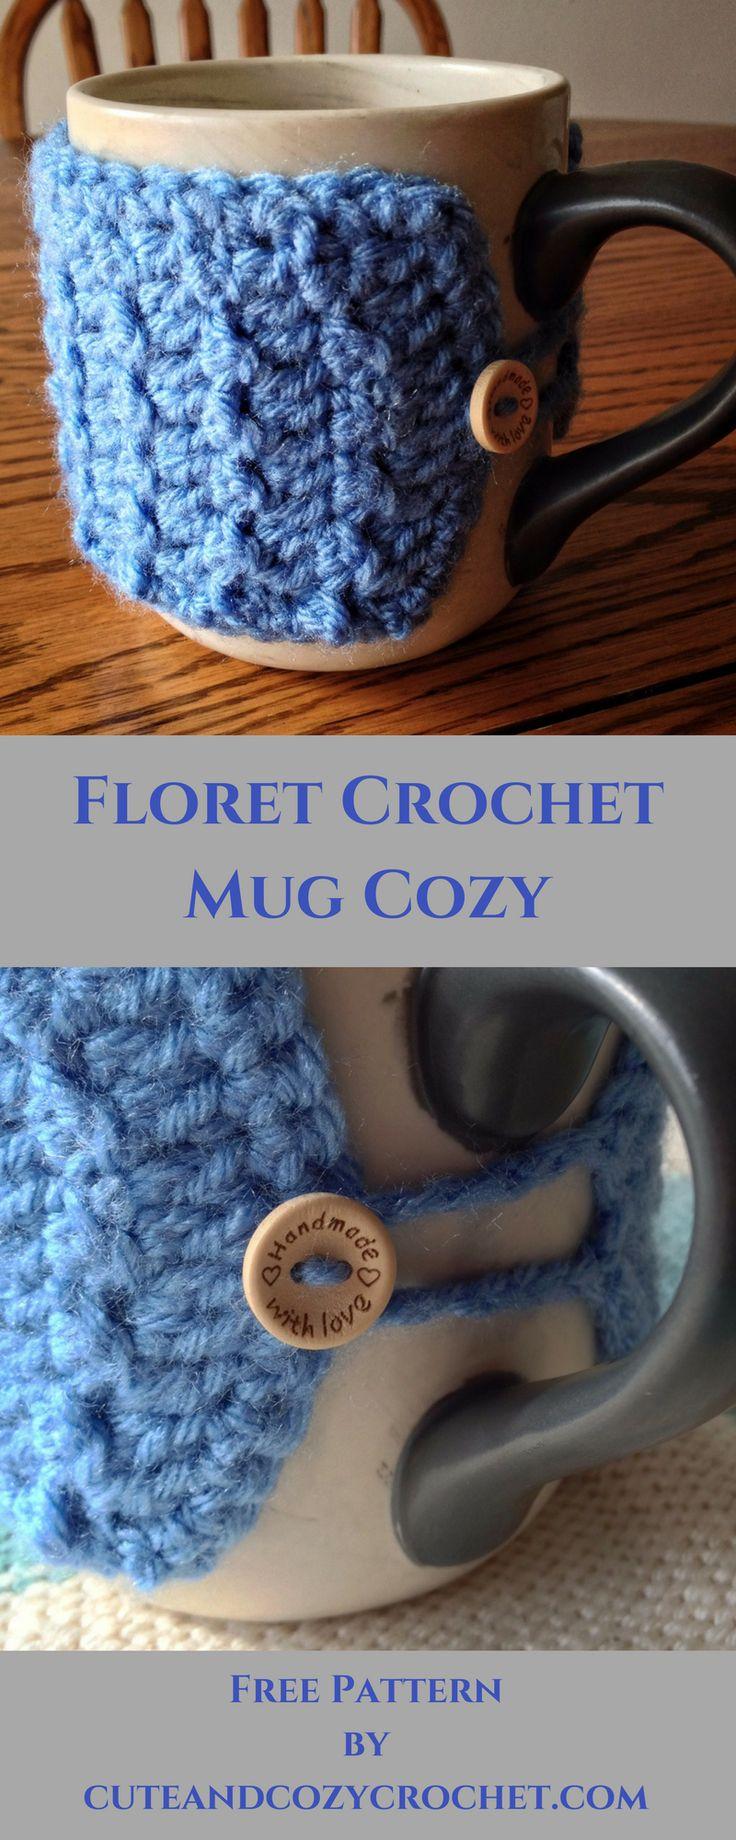 Floret Crochet Mug Cozy | Free  Crochet Pattern | Cup Cozy | Coffee | Warmer | Floret Stitch | Cute Button | Fun Stitches | Cute and Cozy Crochet | Crochet Patterns